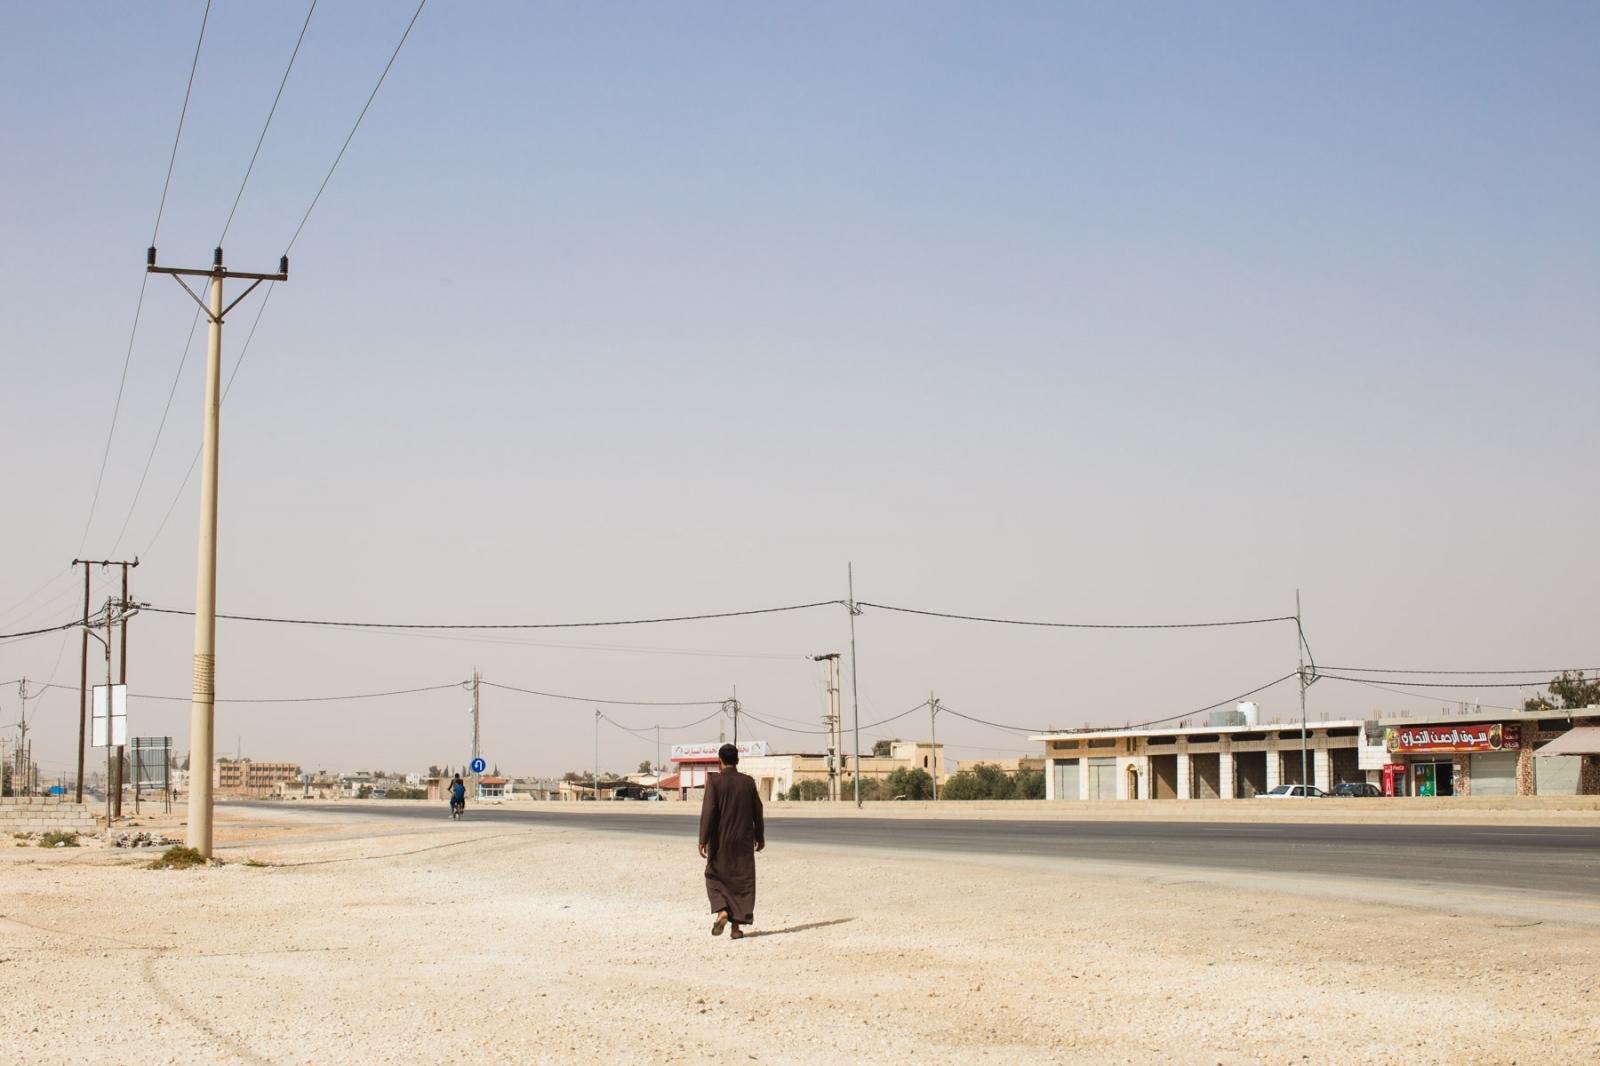 A man walks along the desert stretch of road outside of Za'atari Refugee Camp in northern Jordan.